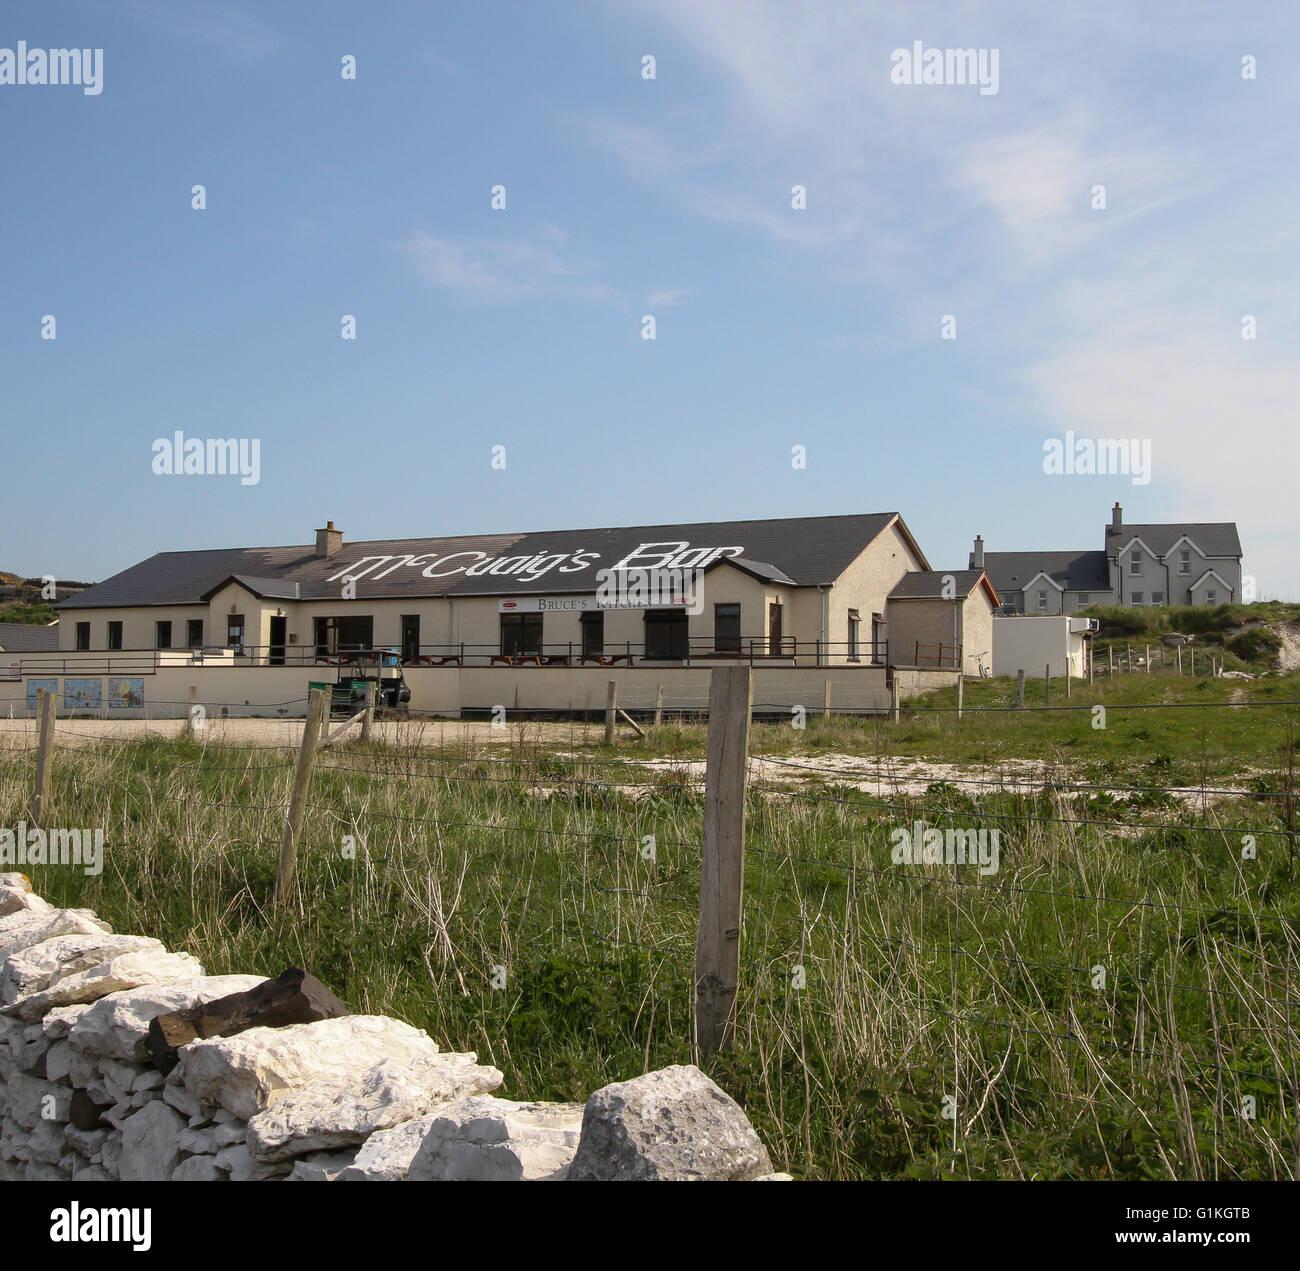 County Antrim Ni Stock Photos & County Antrim Ni Stock Images - Alamy